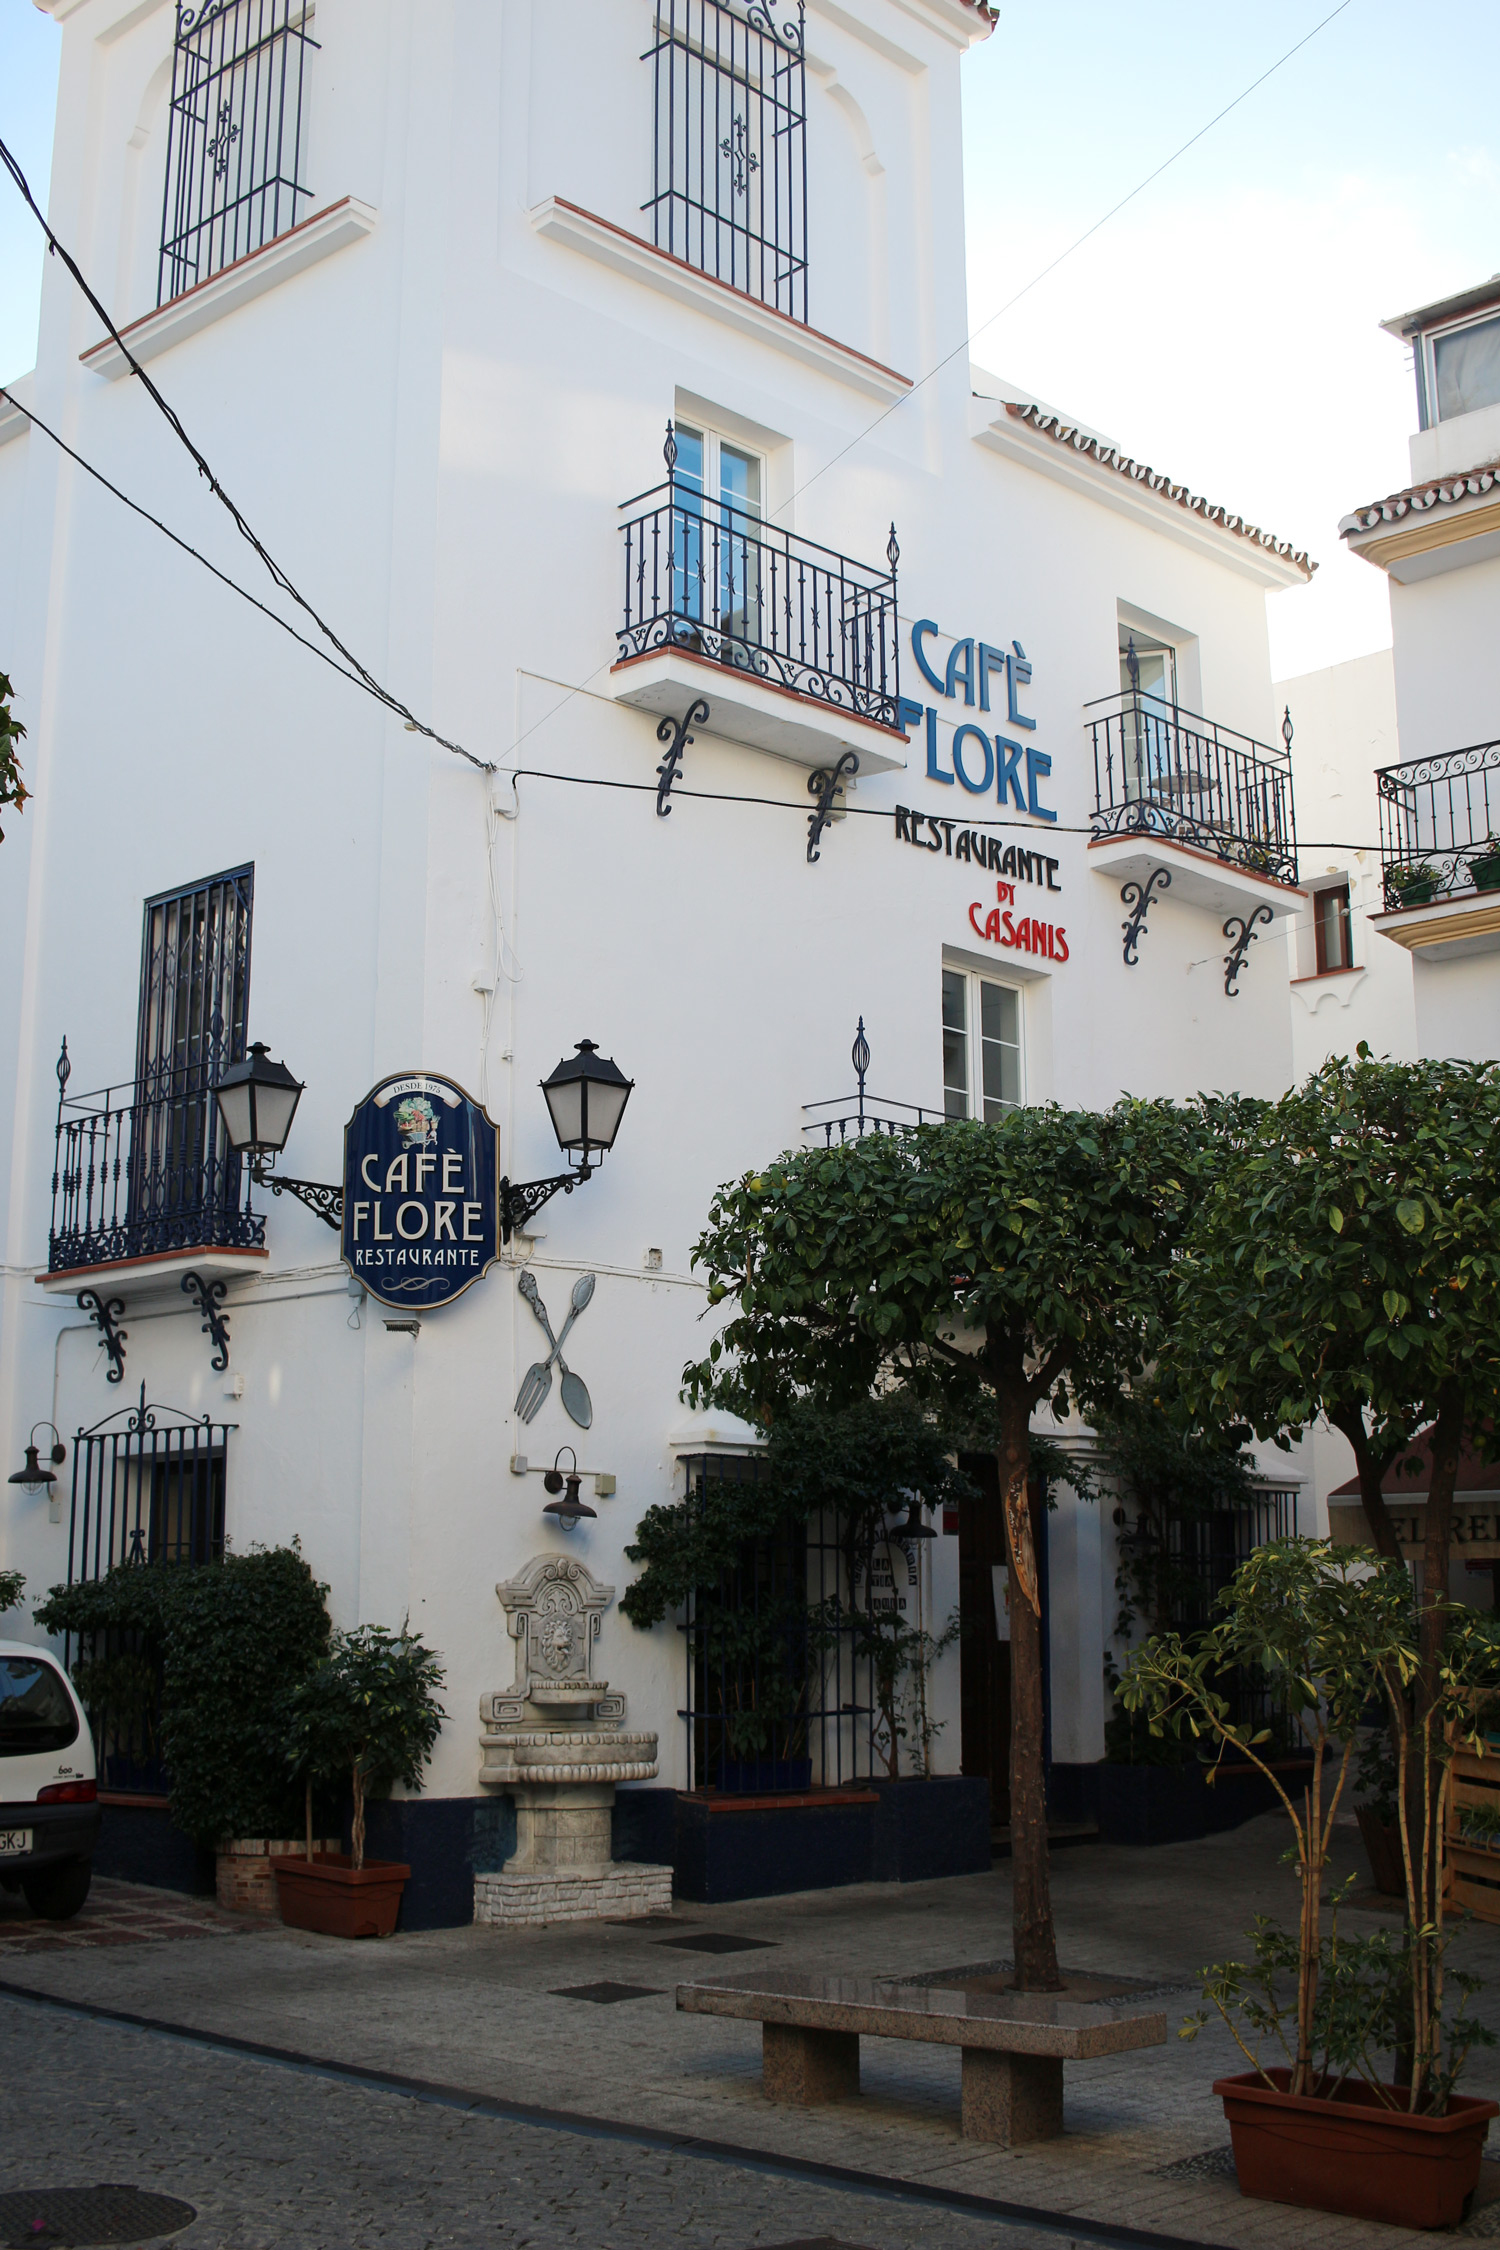 marbella-malaga-spain-travel-blogger-old-town-marbella-11